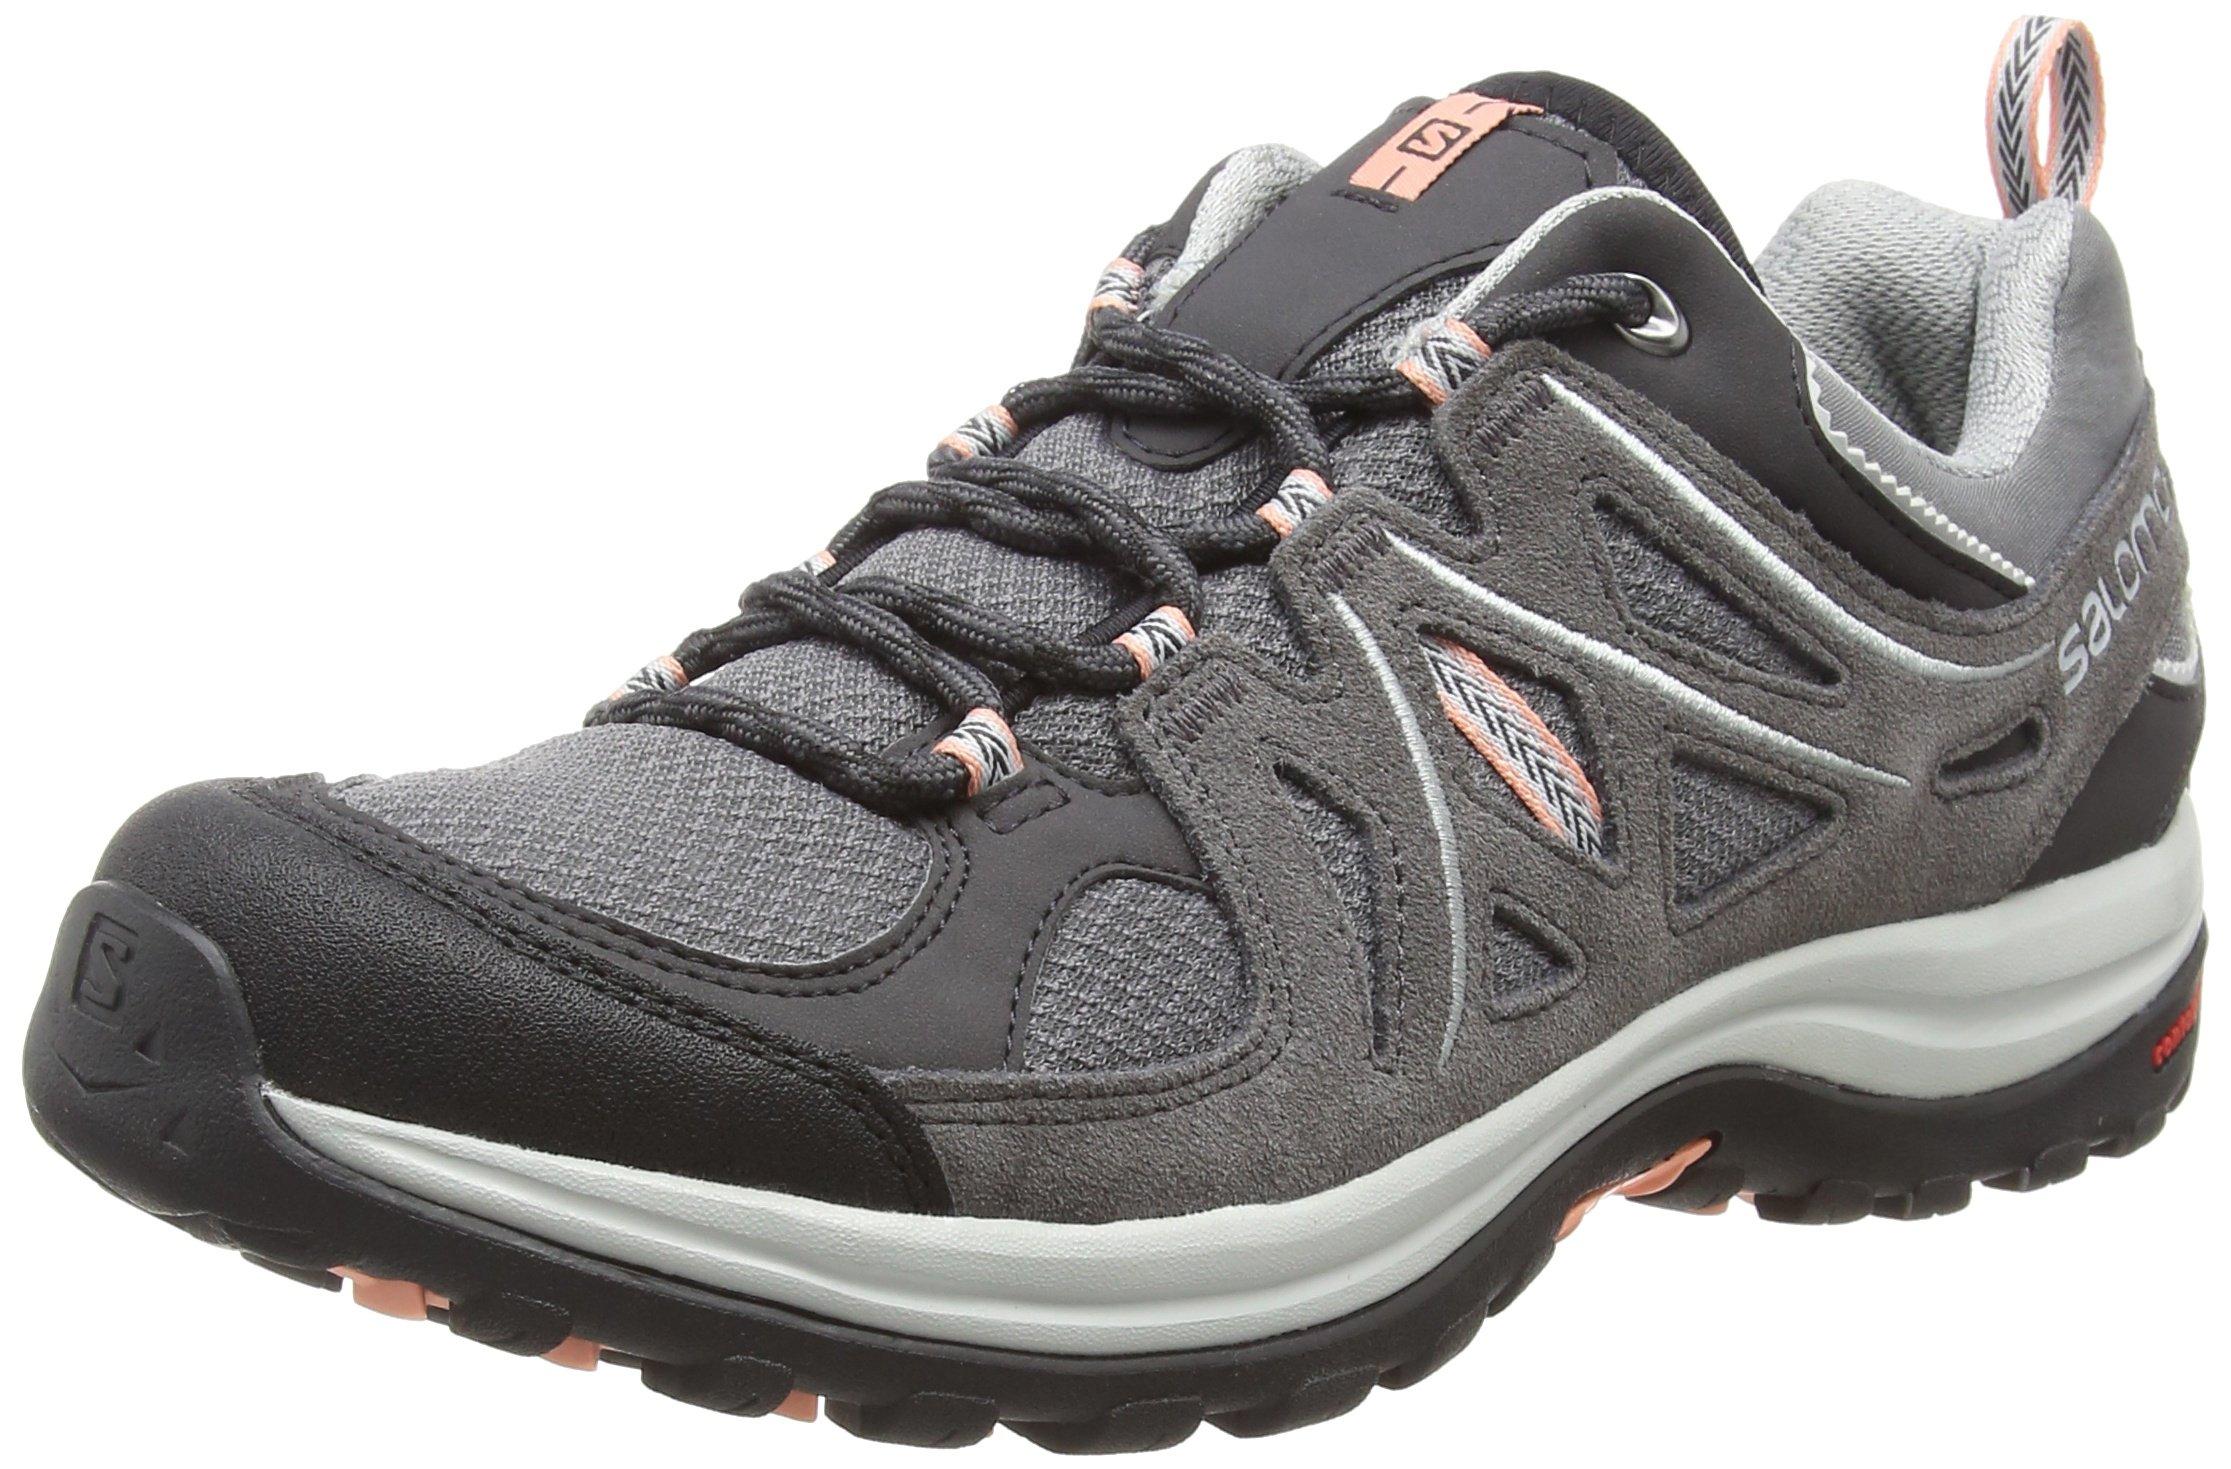 Salomon Women's Hiking Shoes, Ellipse 2